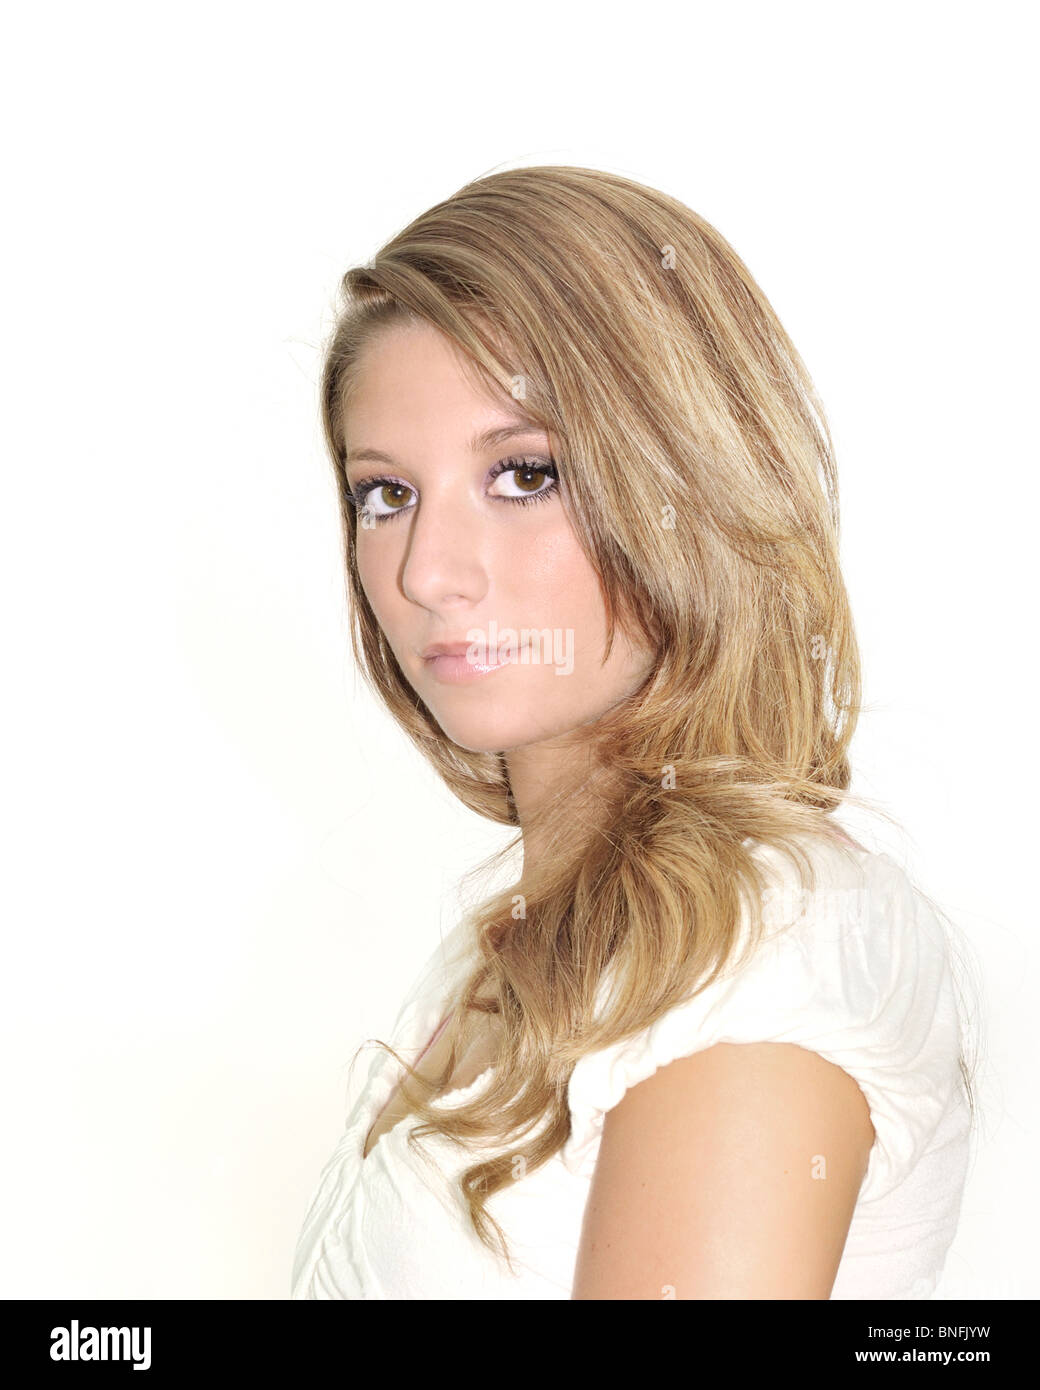 A  closeup high key portrait of a pretty teenage Caucasian girl, white background. - Stock Image